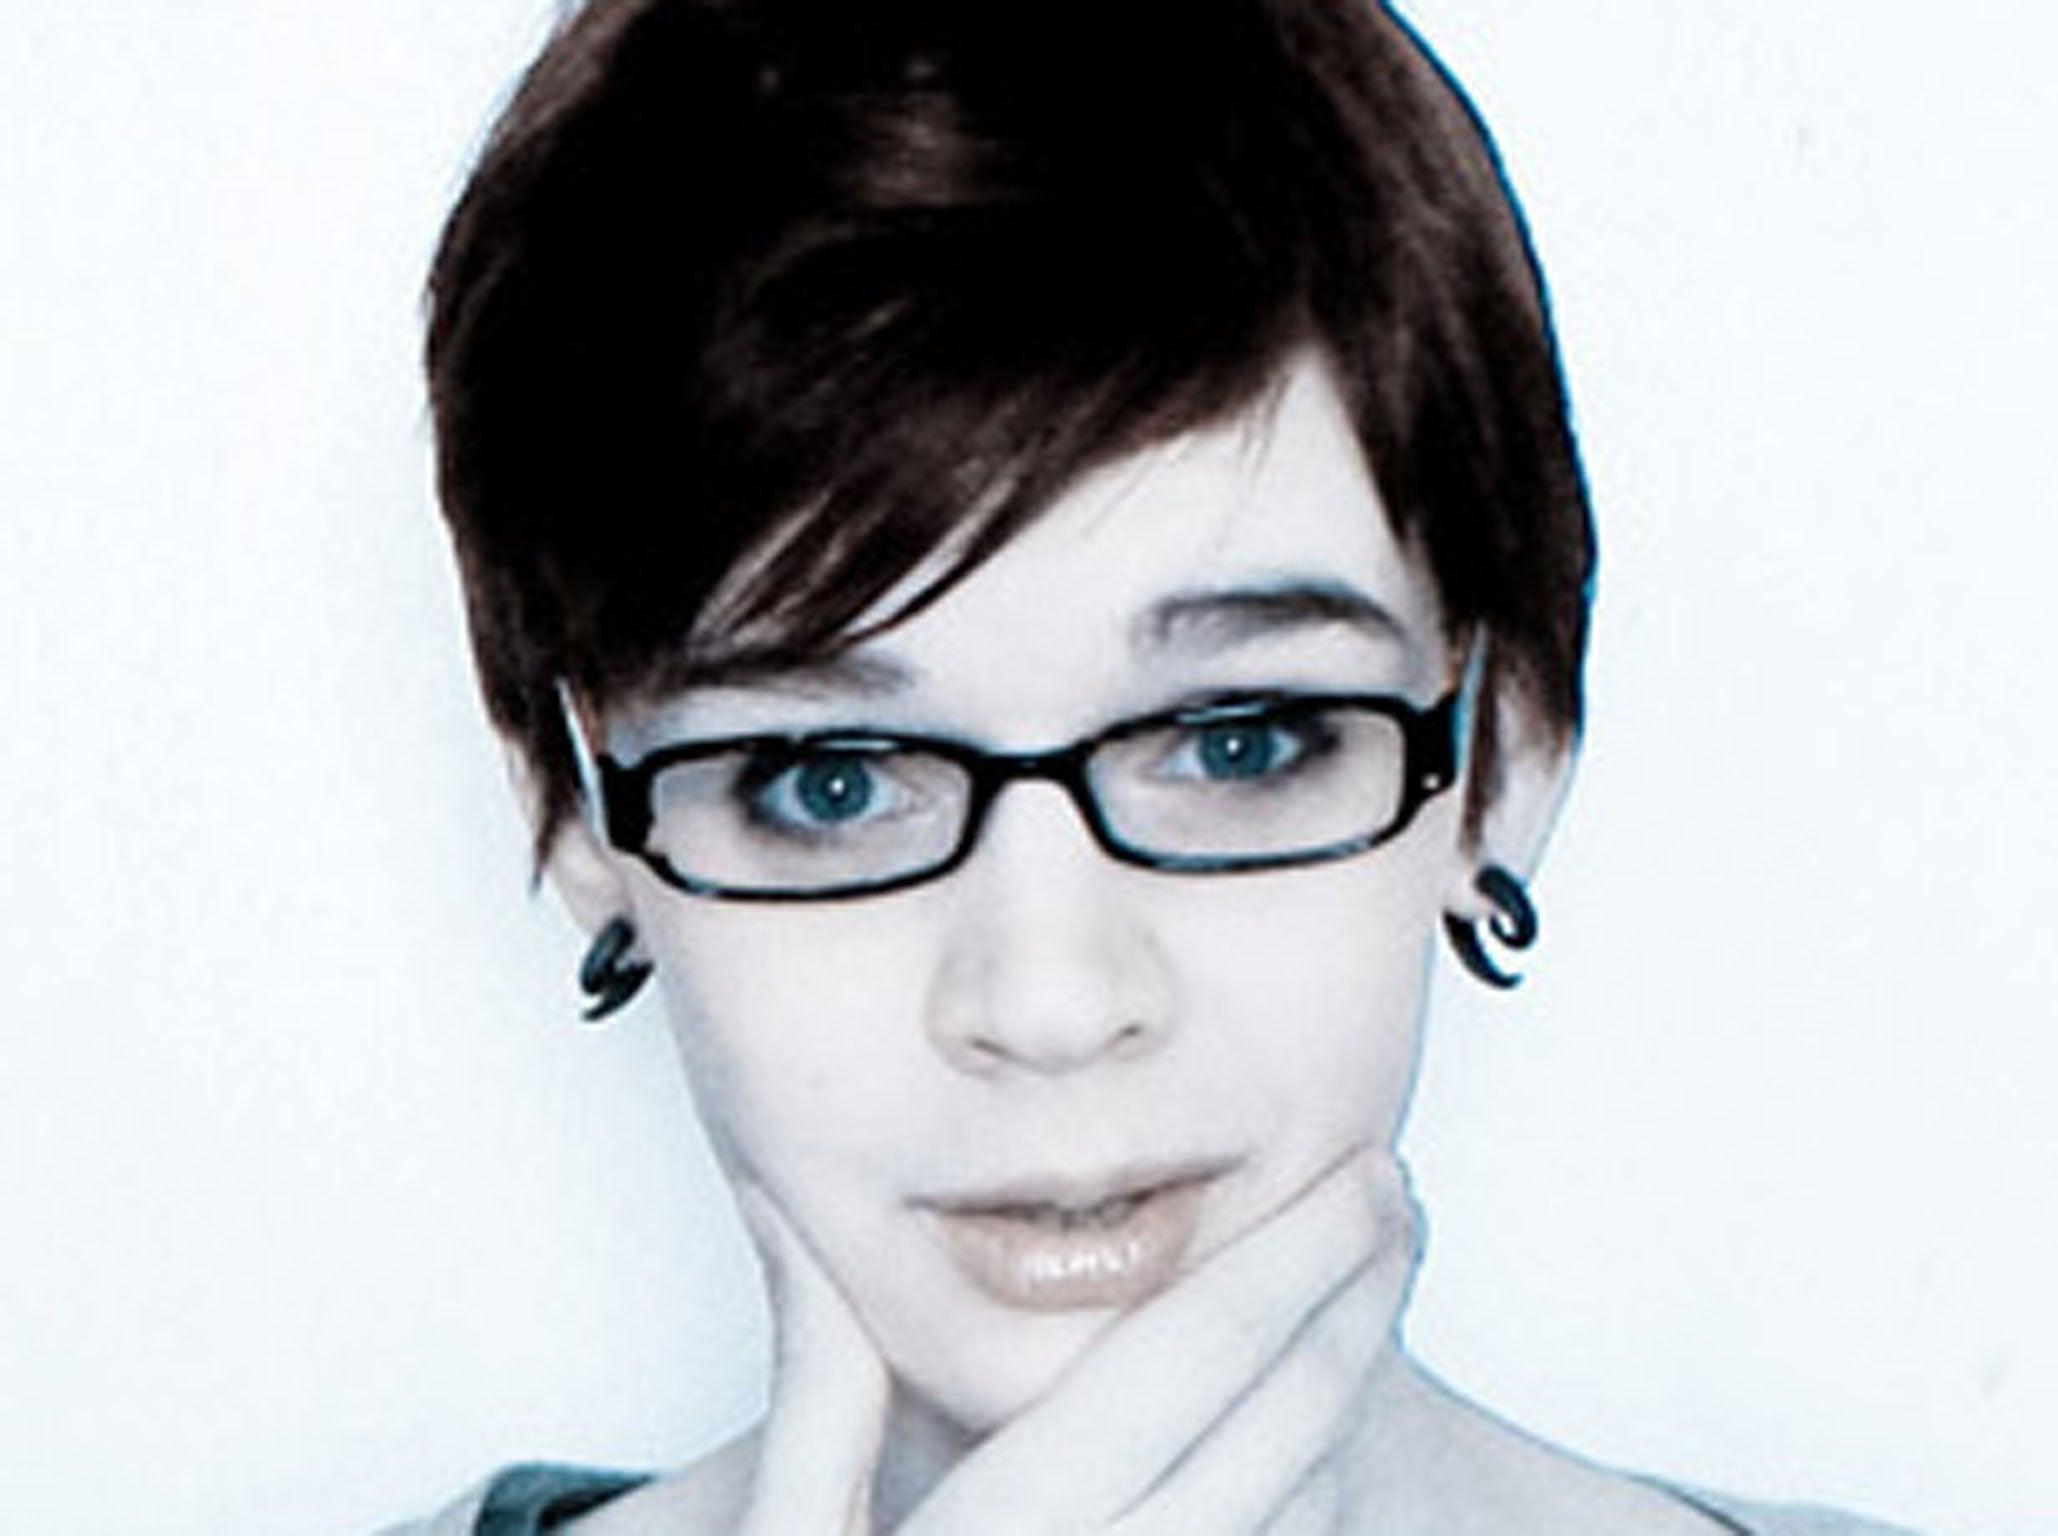 Interviewer surprised by transvestites voice